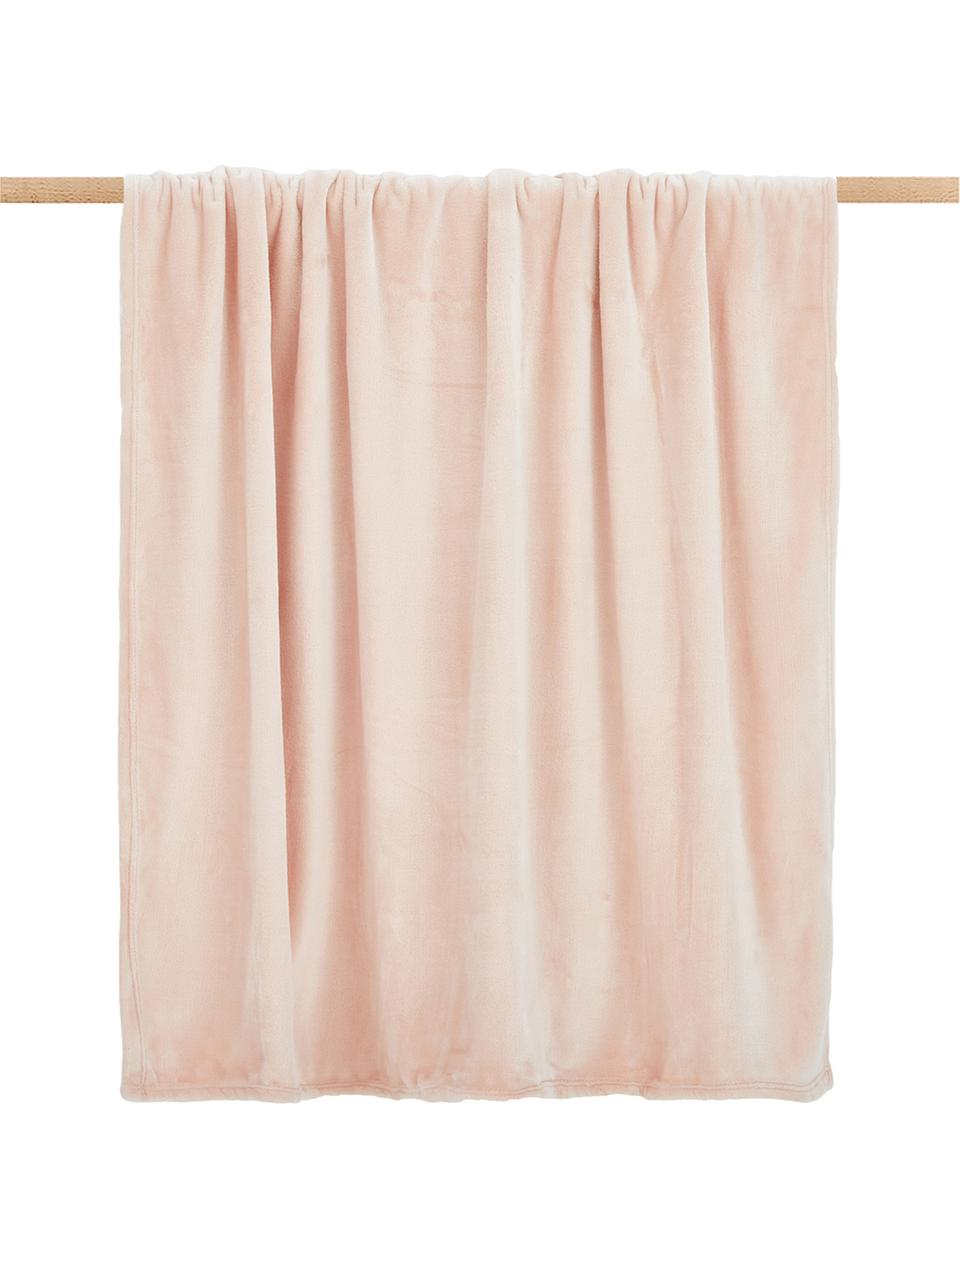 Plaid in morbido pile rosa cipria Doudou, 100% poliestere, Rosa cipria, Larg. 130 x Lung. 160 cm